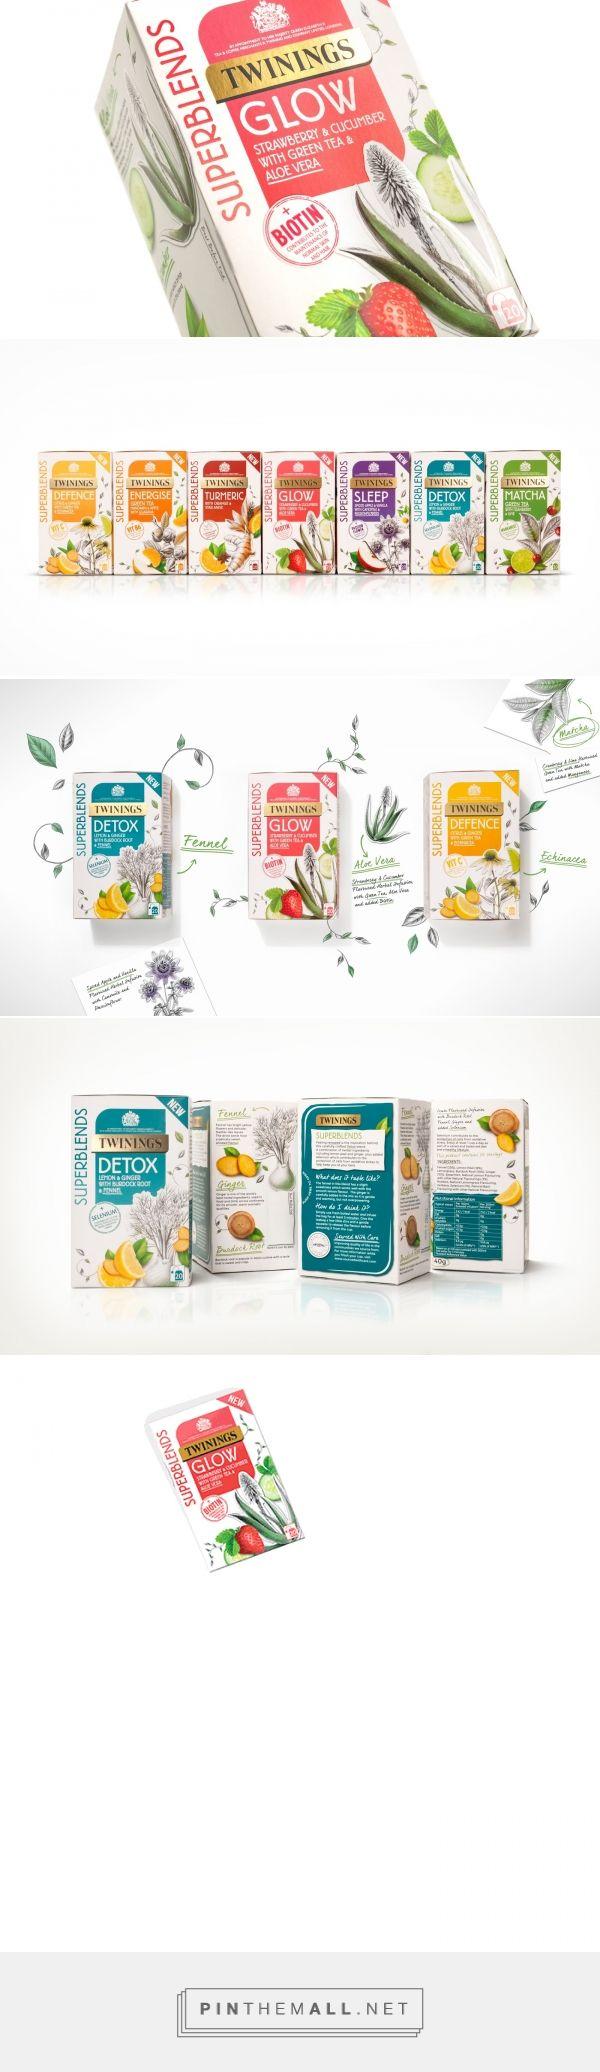 Twinings SuperBlends tea packaging design by BrandOpus - http://www.packagingoftheworld.com/2018/02/twinings-superblends.html